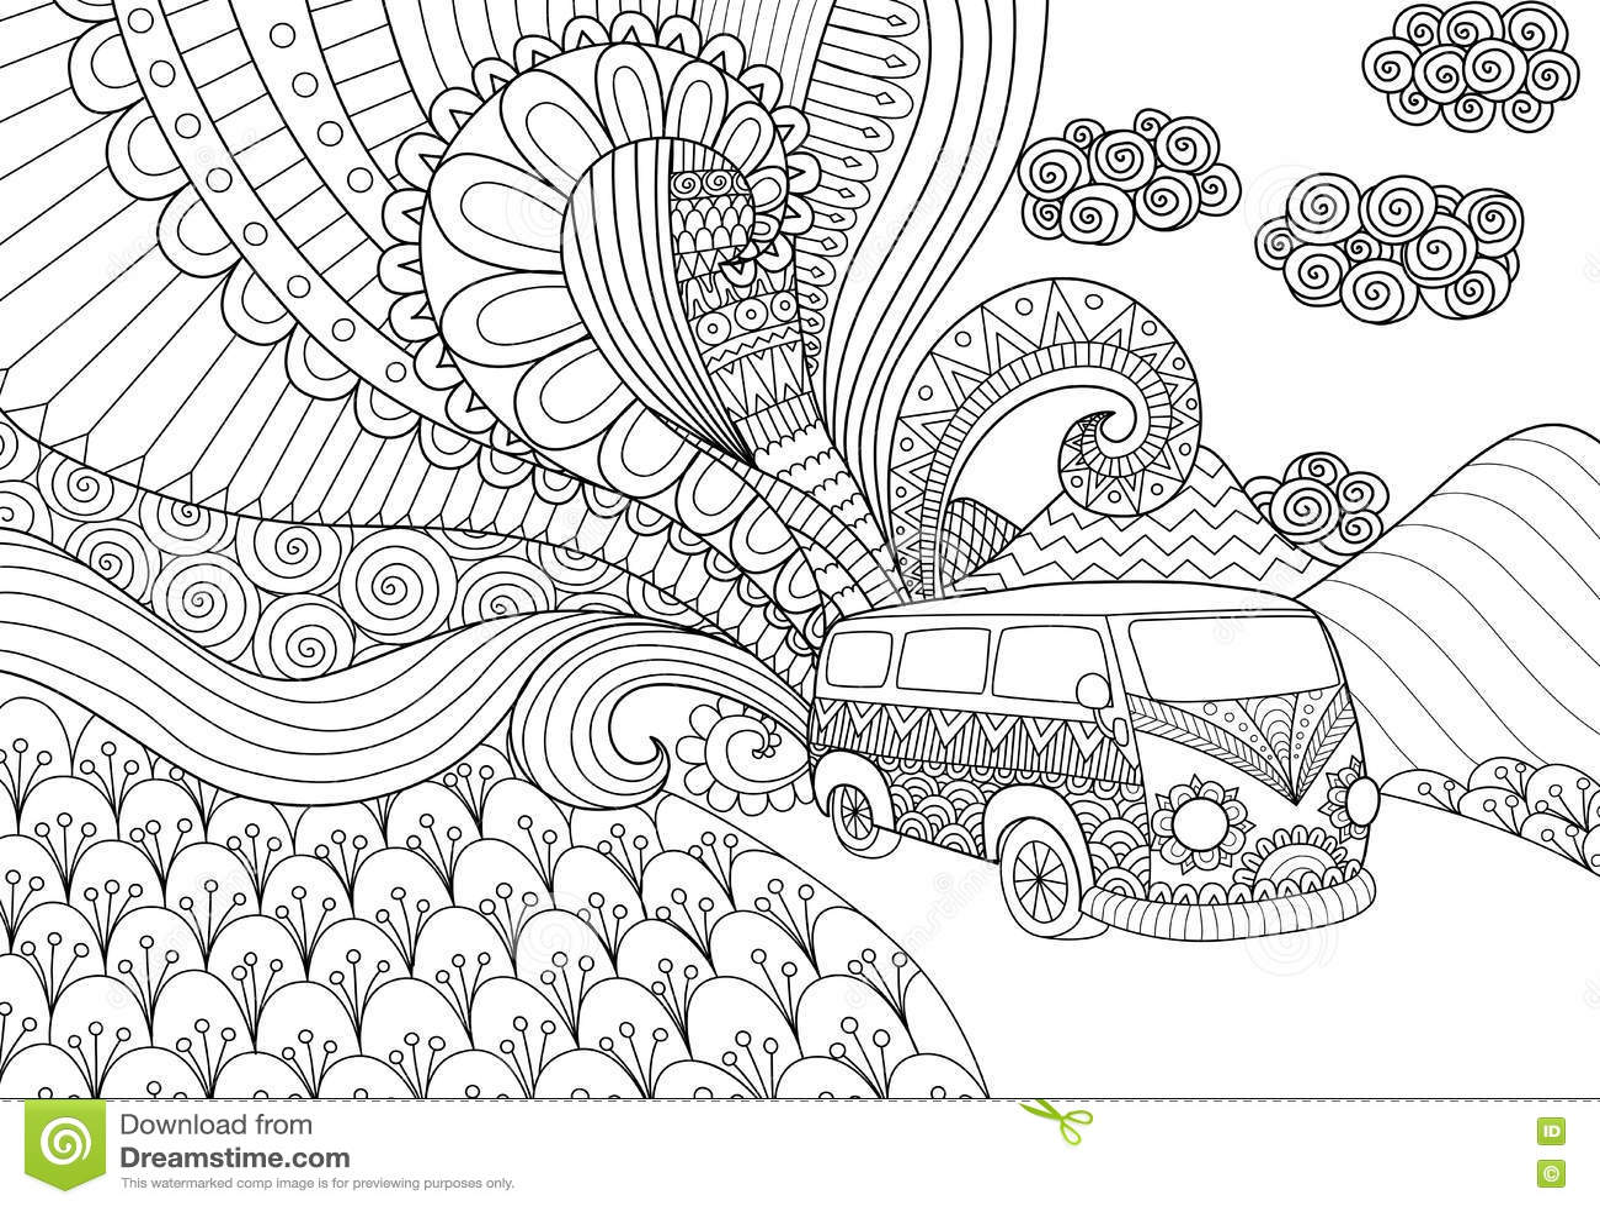 Doodles design of piano for coloring book for adult for Disegni da colorare per adulti paesaggi